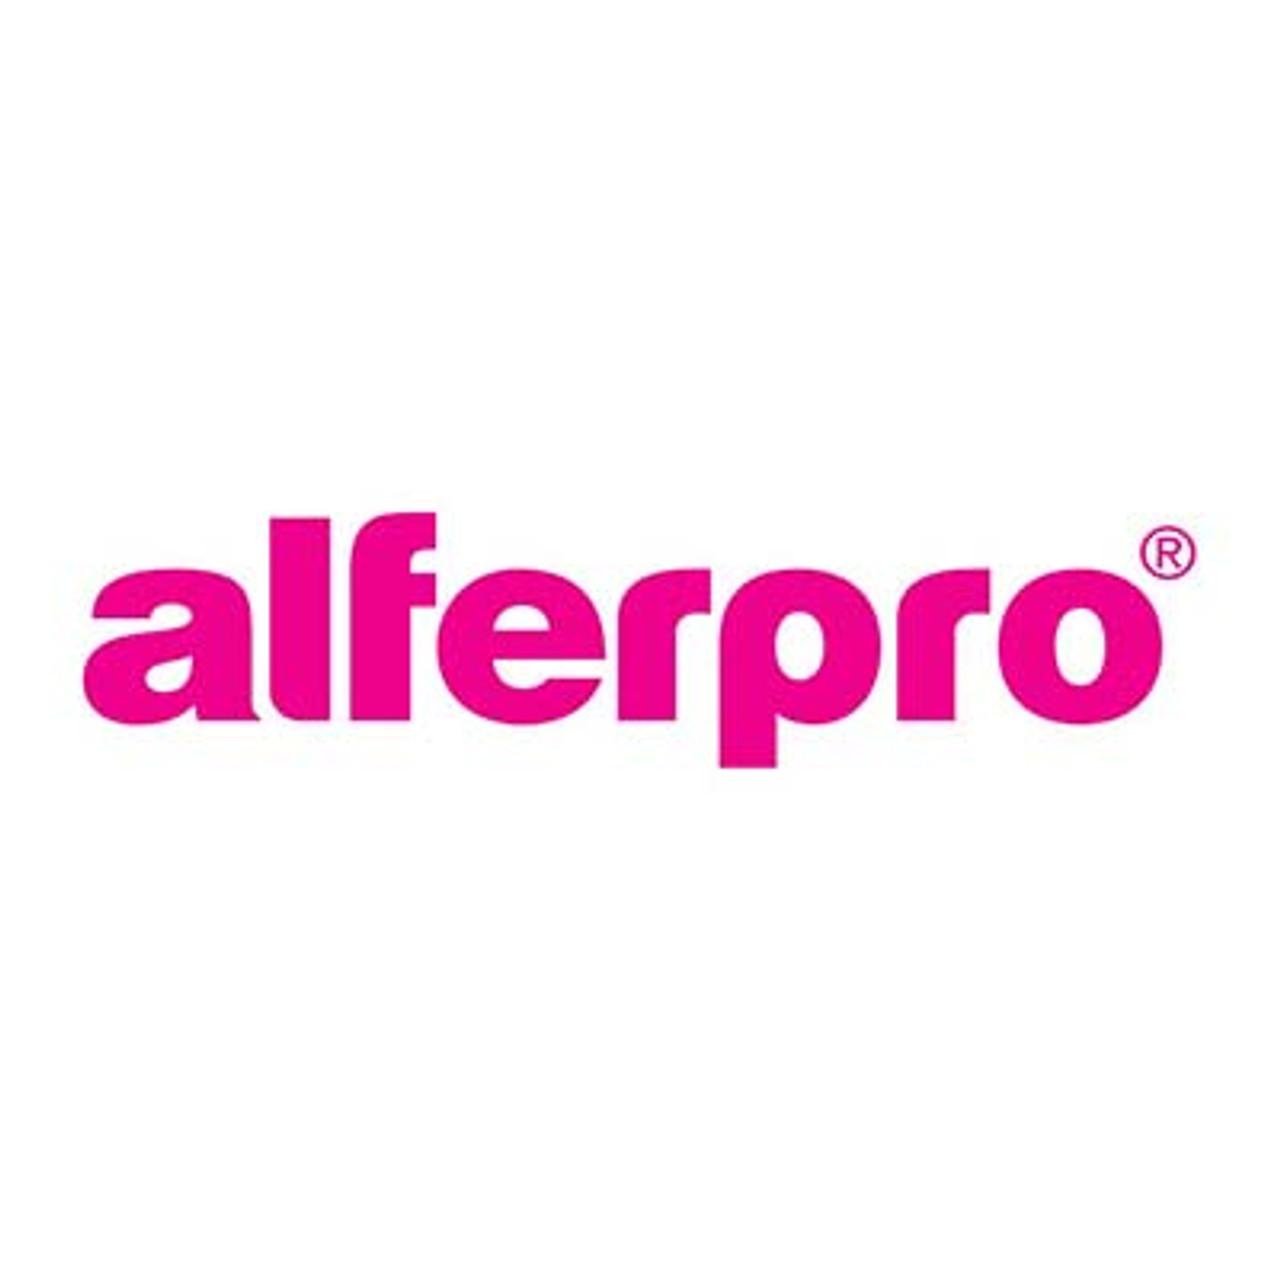 Alferpro